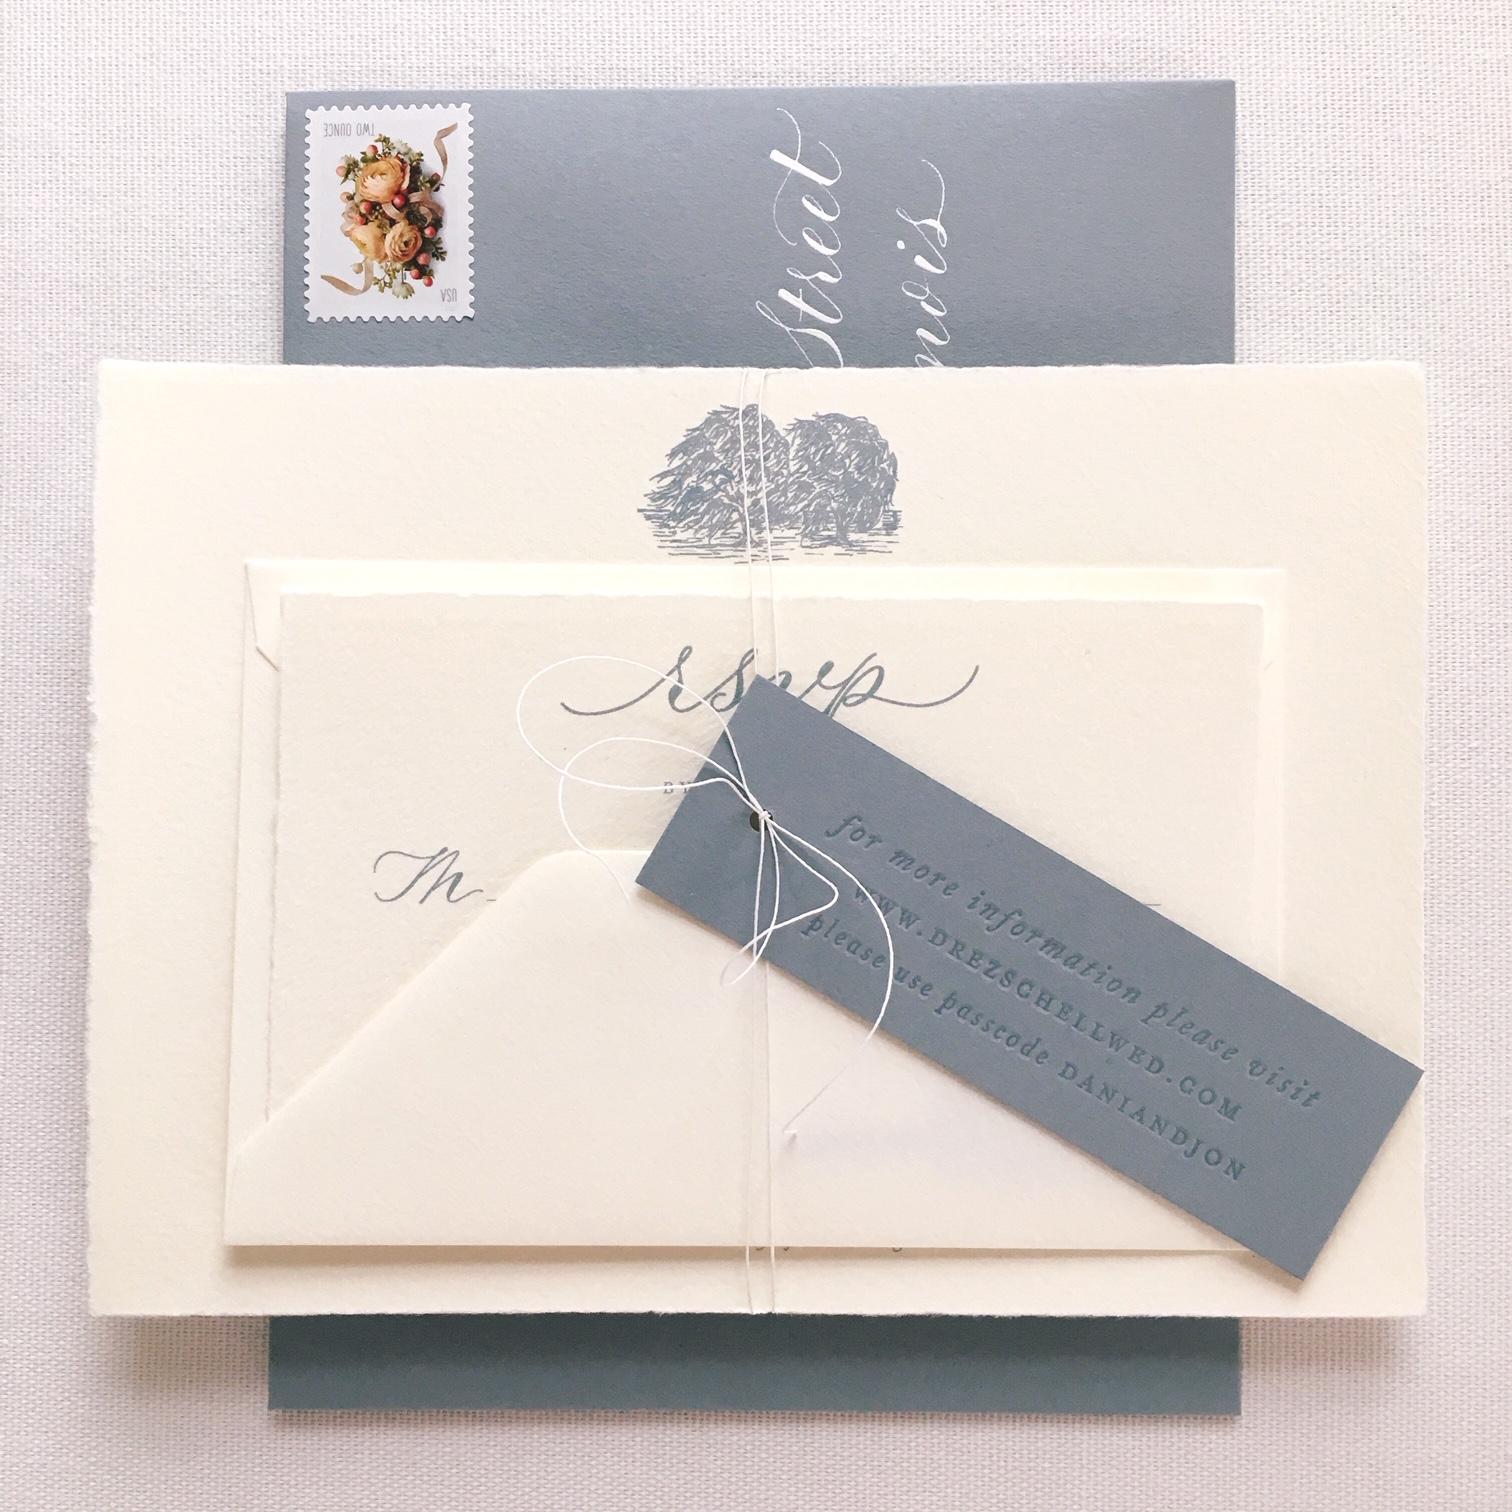 Spot Calligraphy, Stationery Design, Envelope Addressing: Joi Hunt  Letterpress Printing and Illustration: Lydia Evans/Letterpress by Lydia